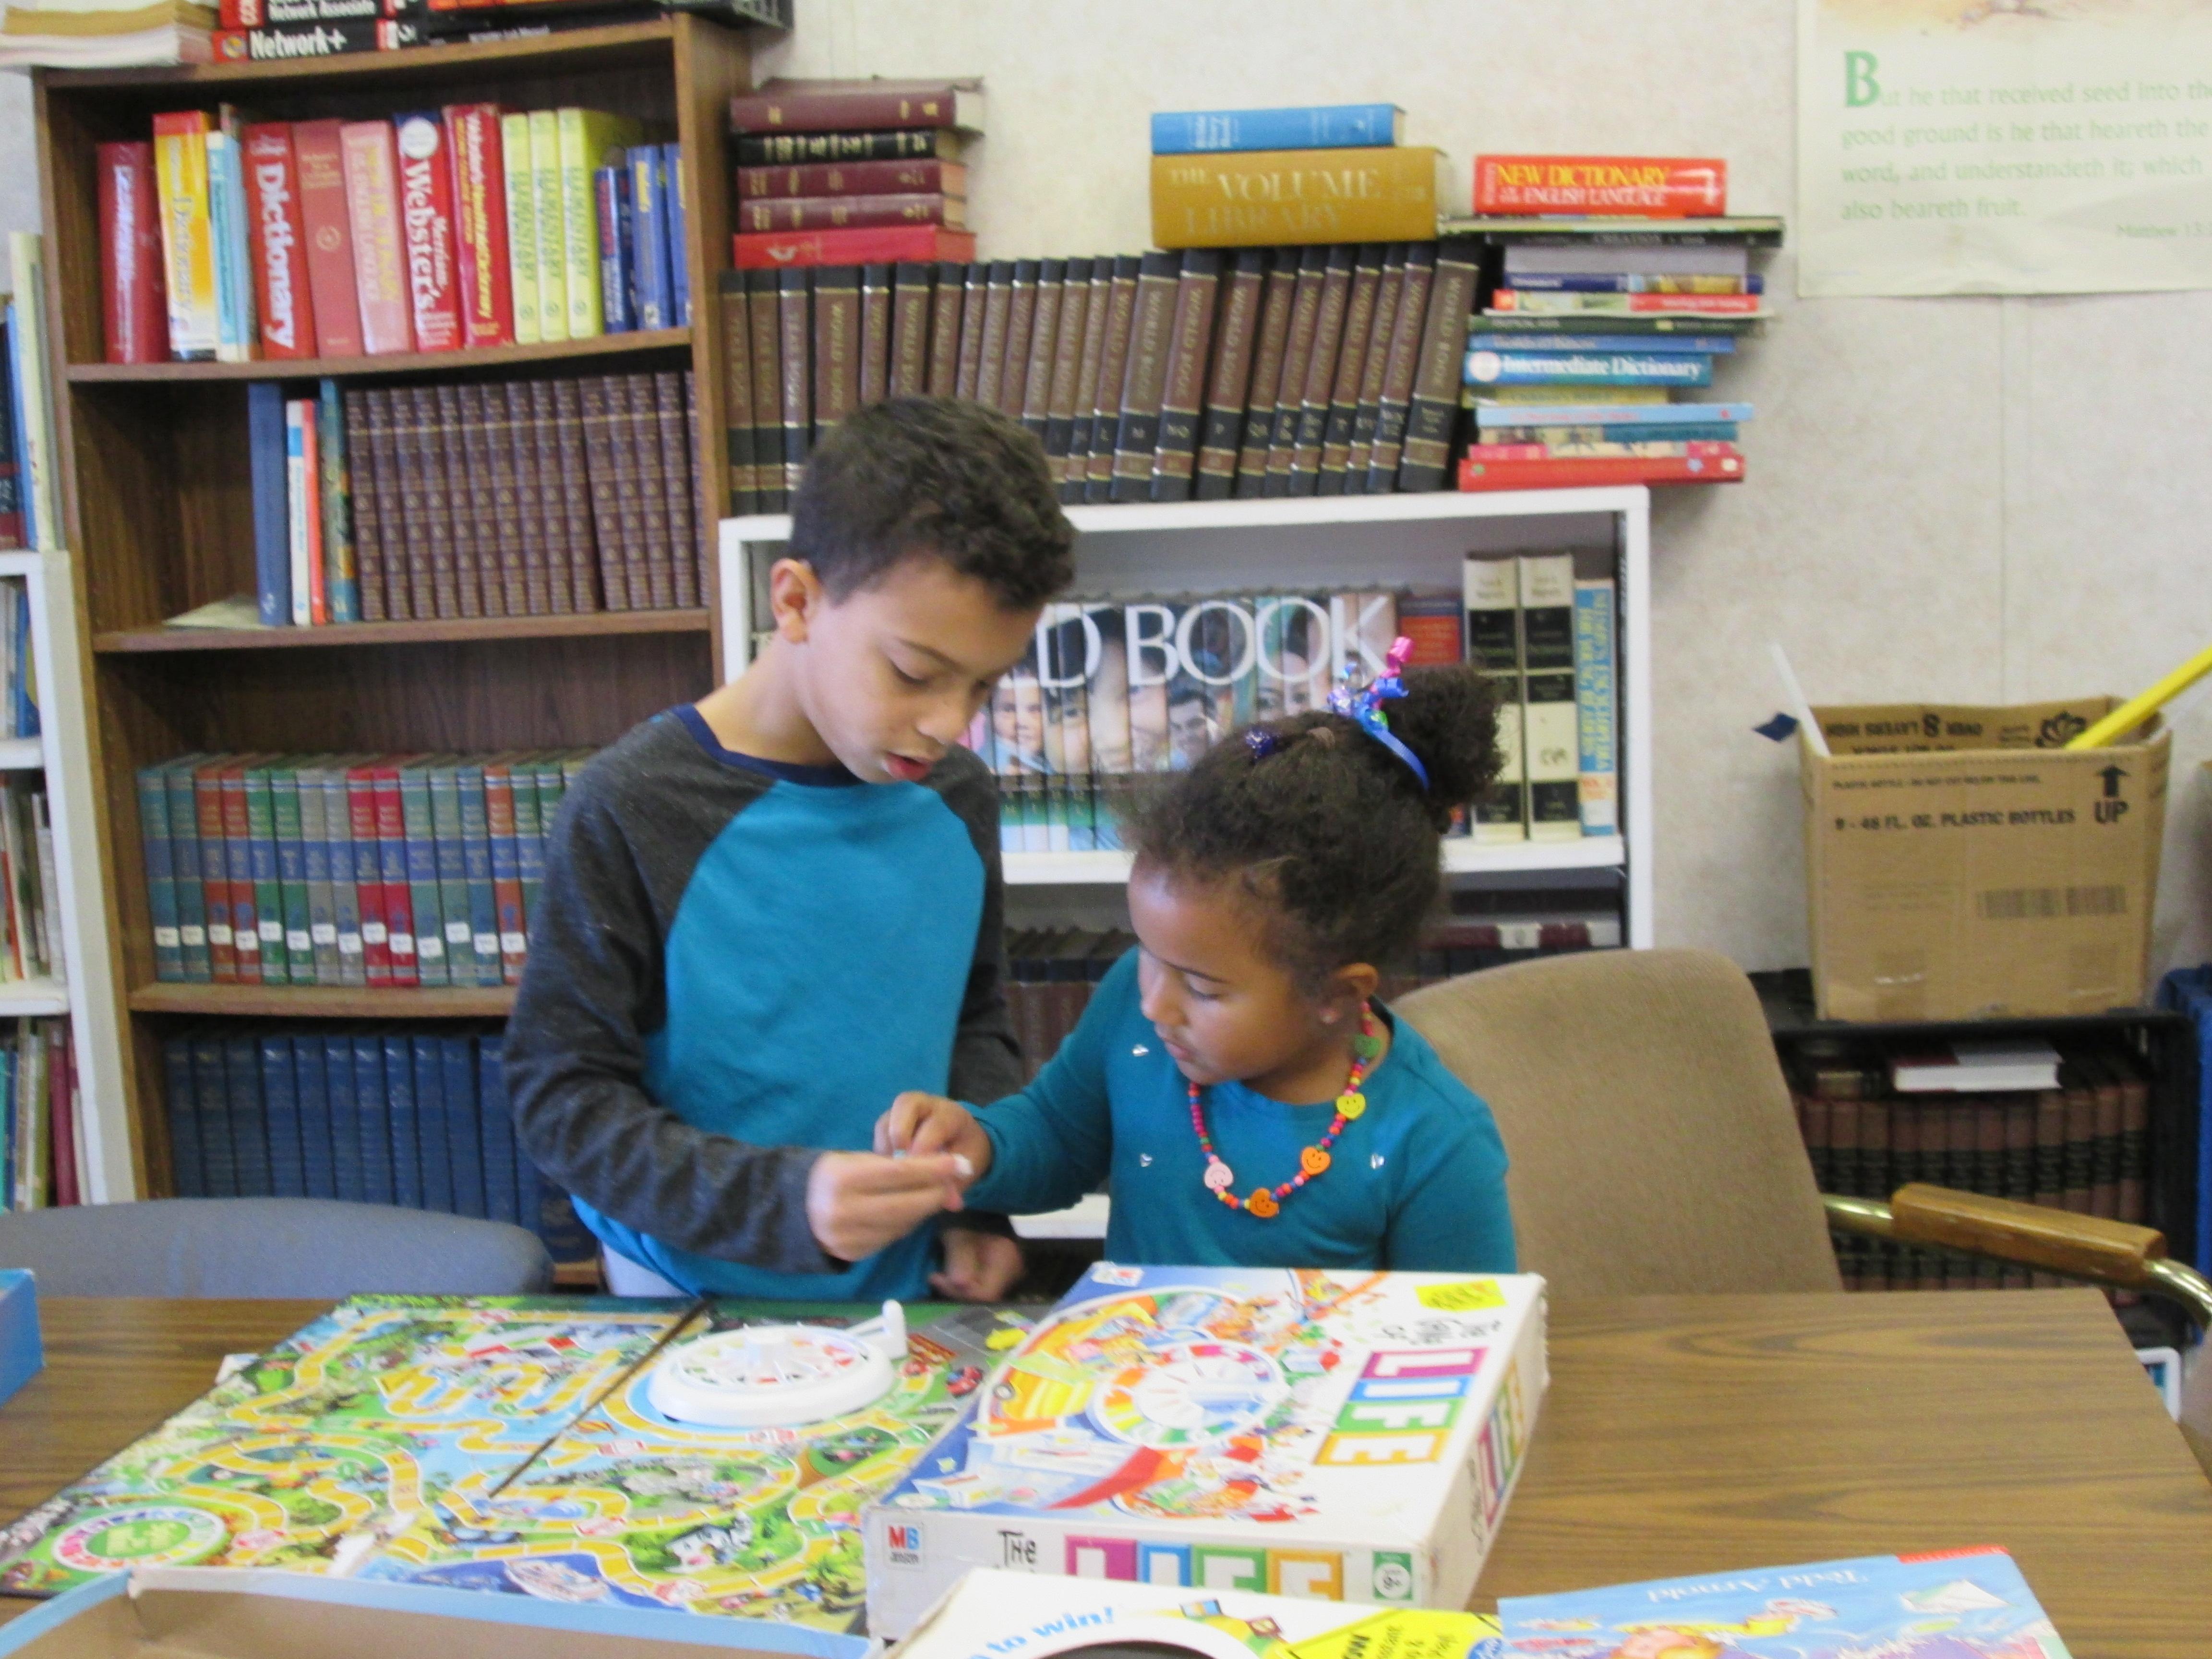 Elementary play life